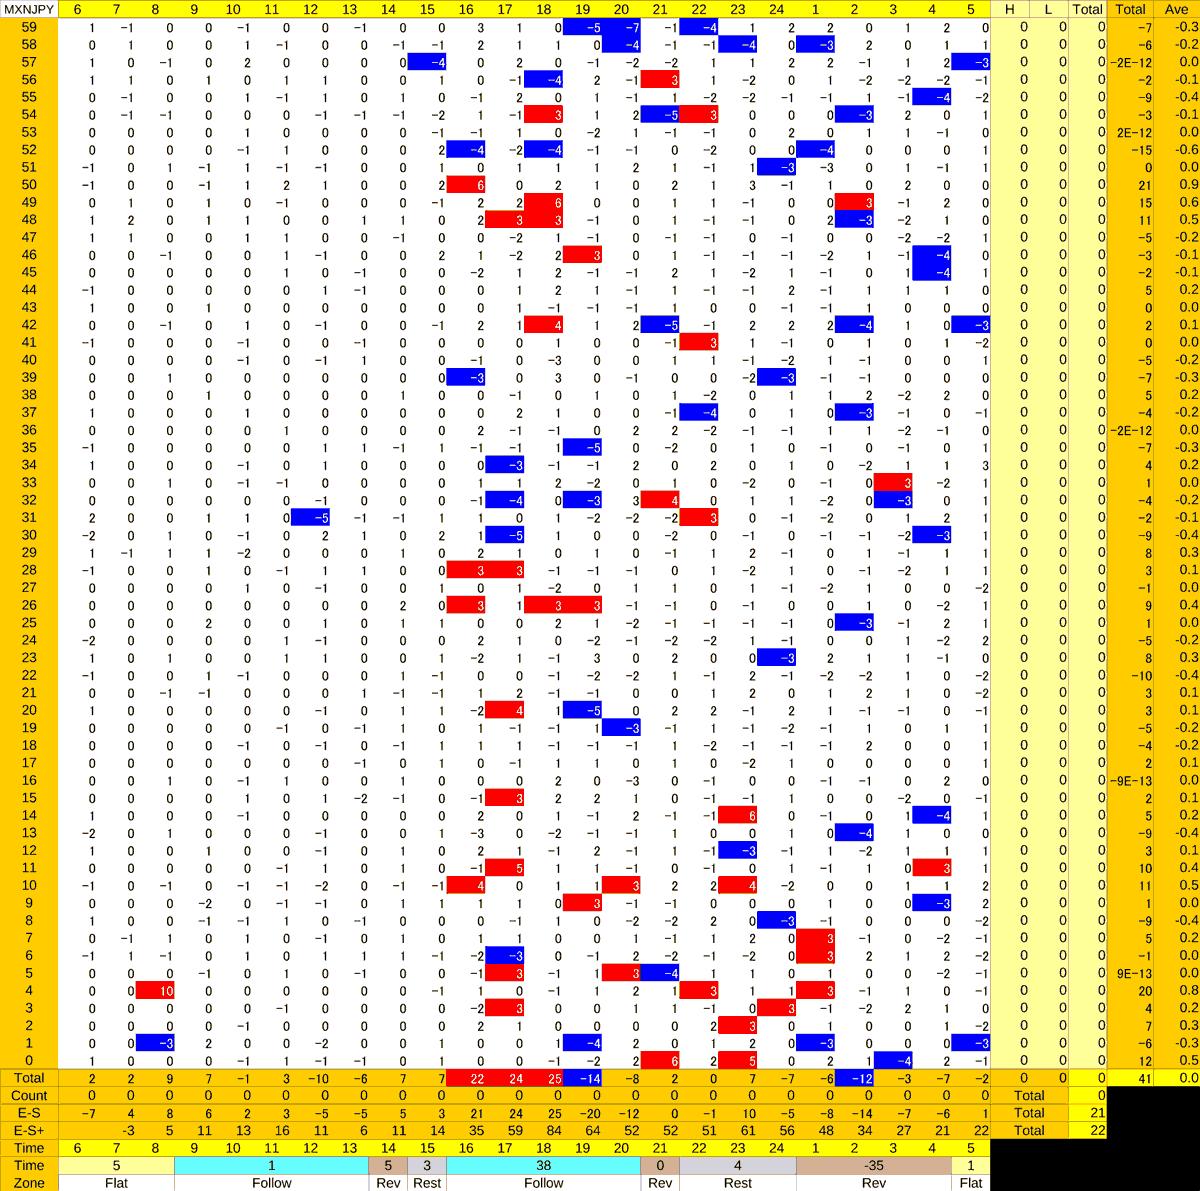 20201103_HS(3)MXNJPY